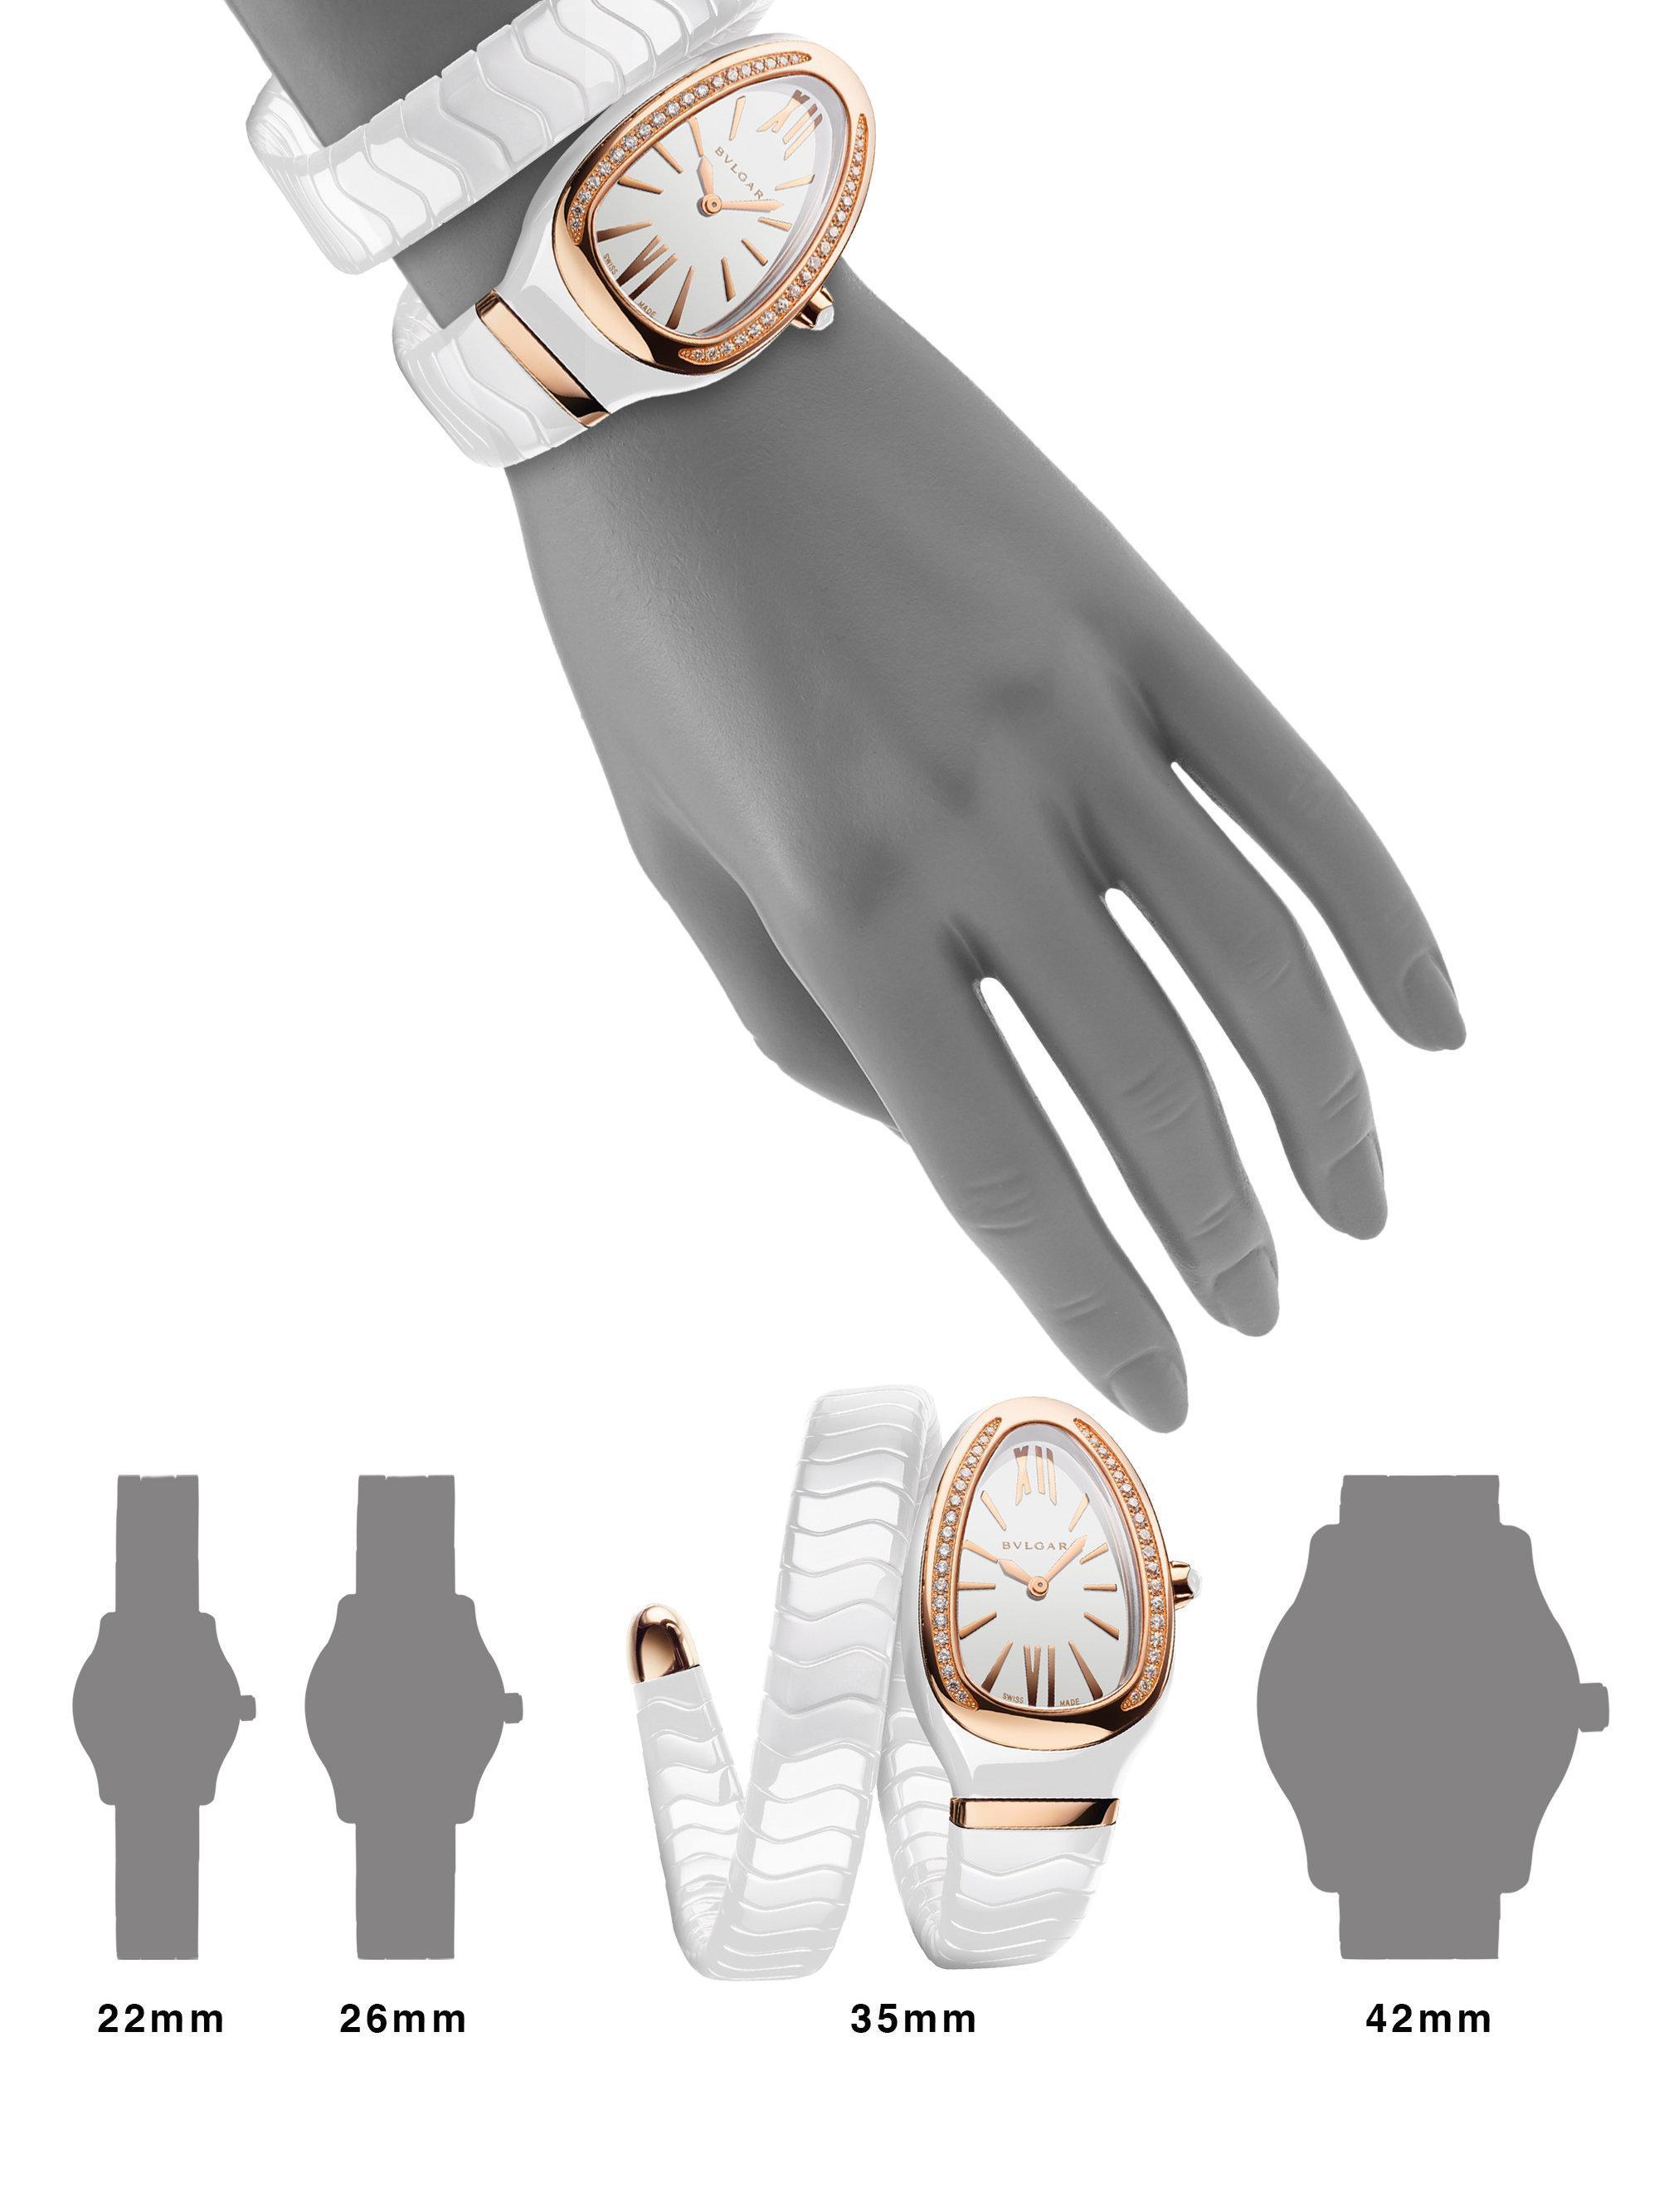 ad8007041f417 BVLGARI Serpenti Spiga Rose Gold, White Ceramic & Diamond Single ...